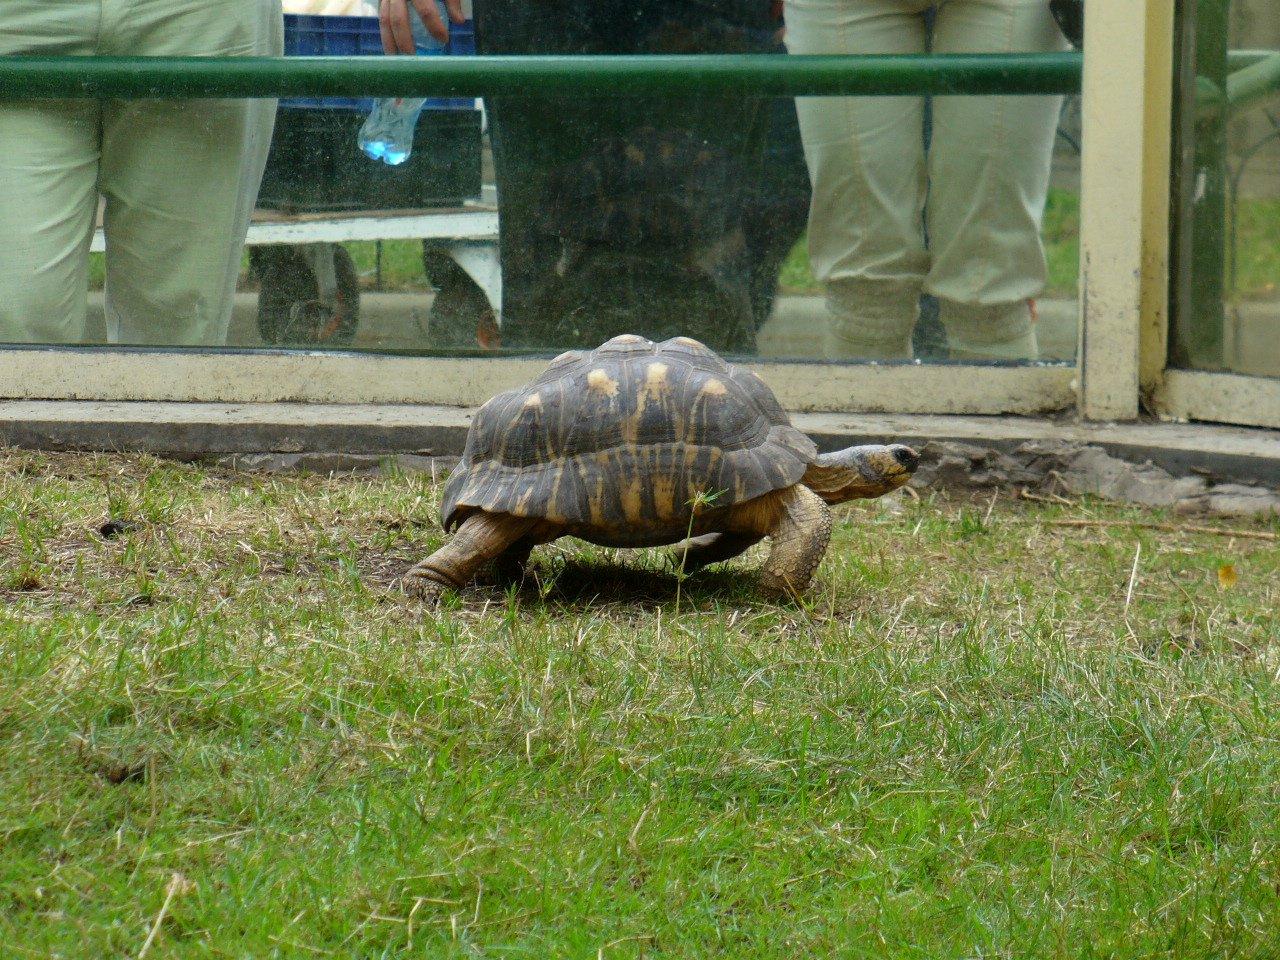 Команда Помощи Черепахам - начало (ч.2)